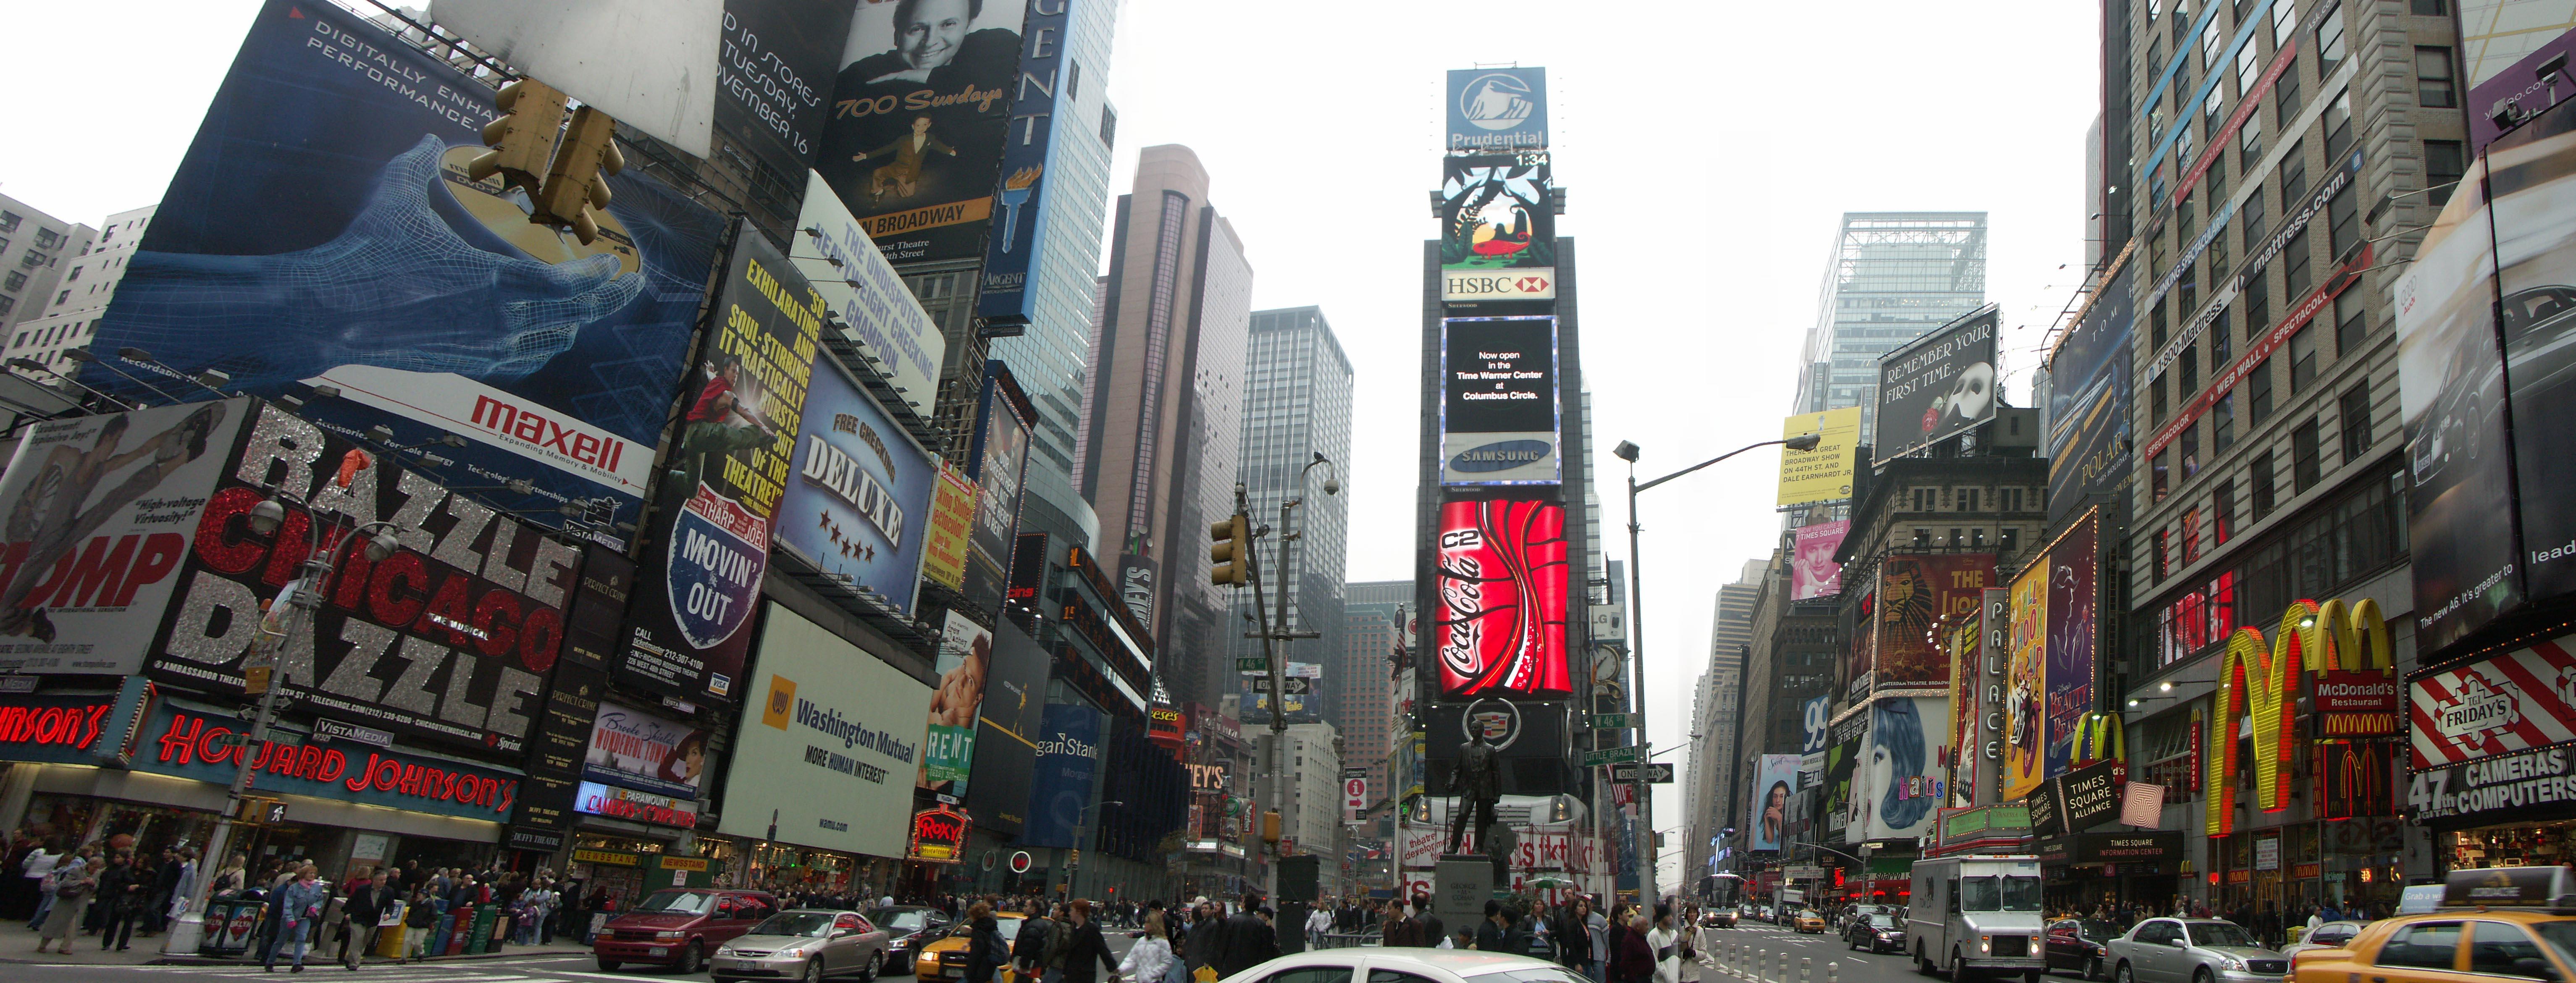 https://upload.wikimedia.org/wikipedia/commons/c/c3/Times_Square_Panorama.jpg